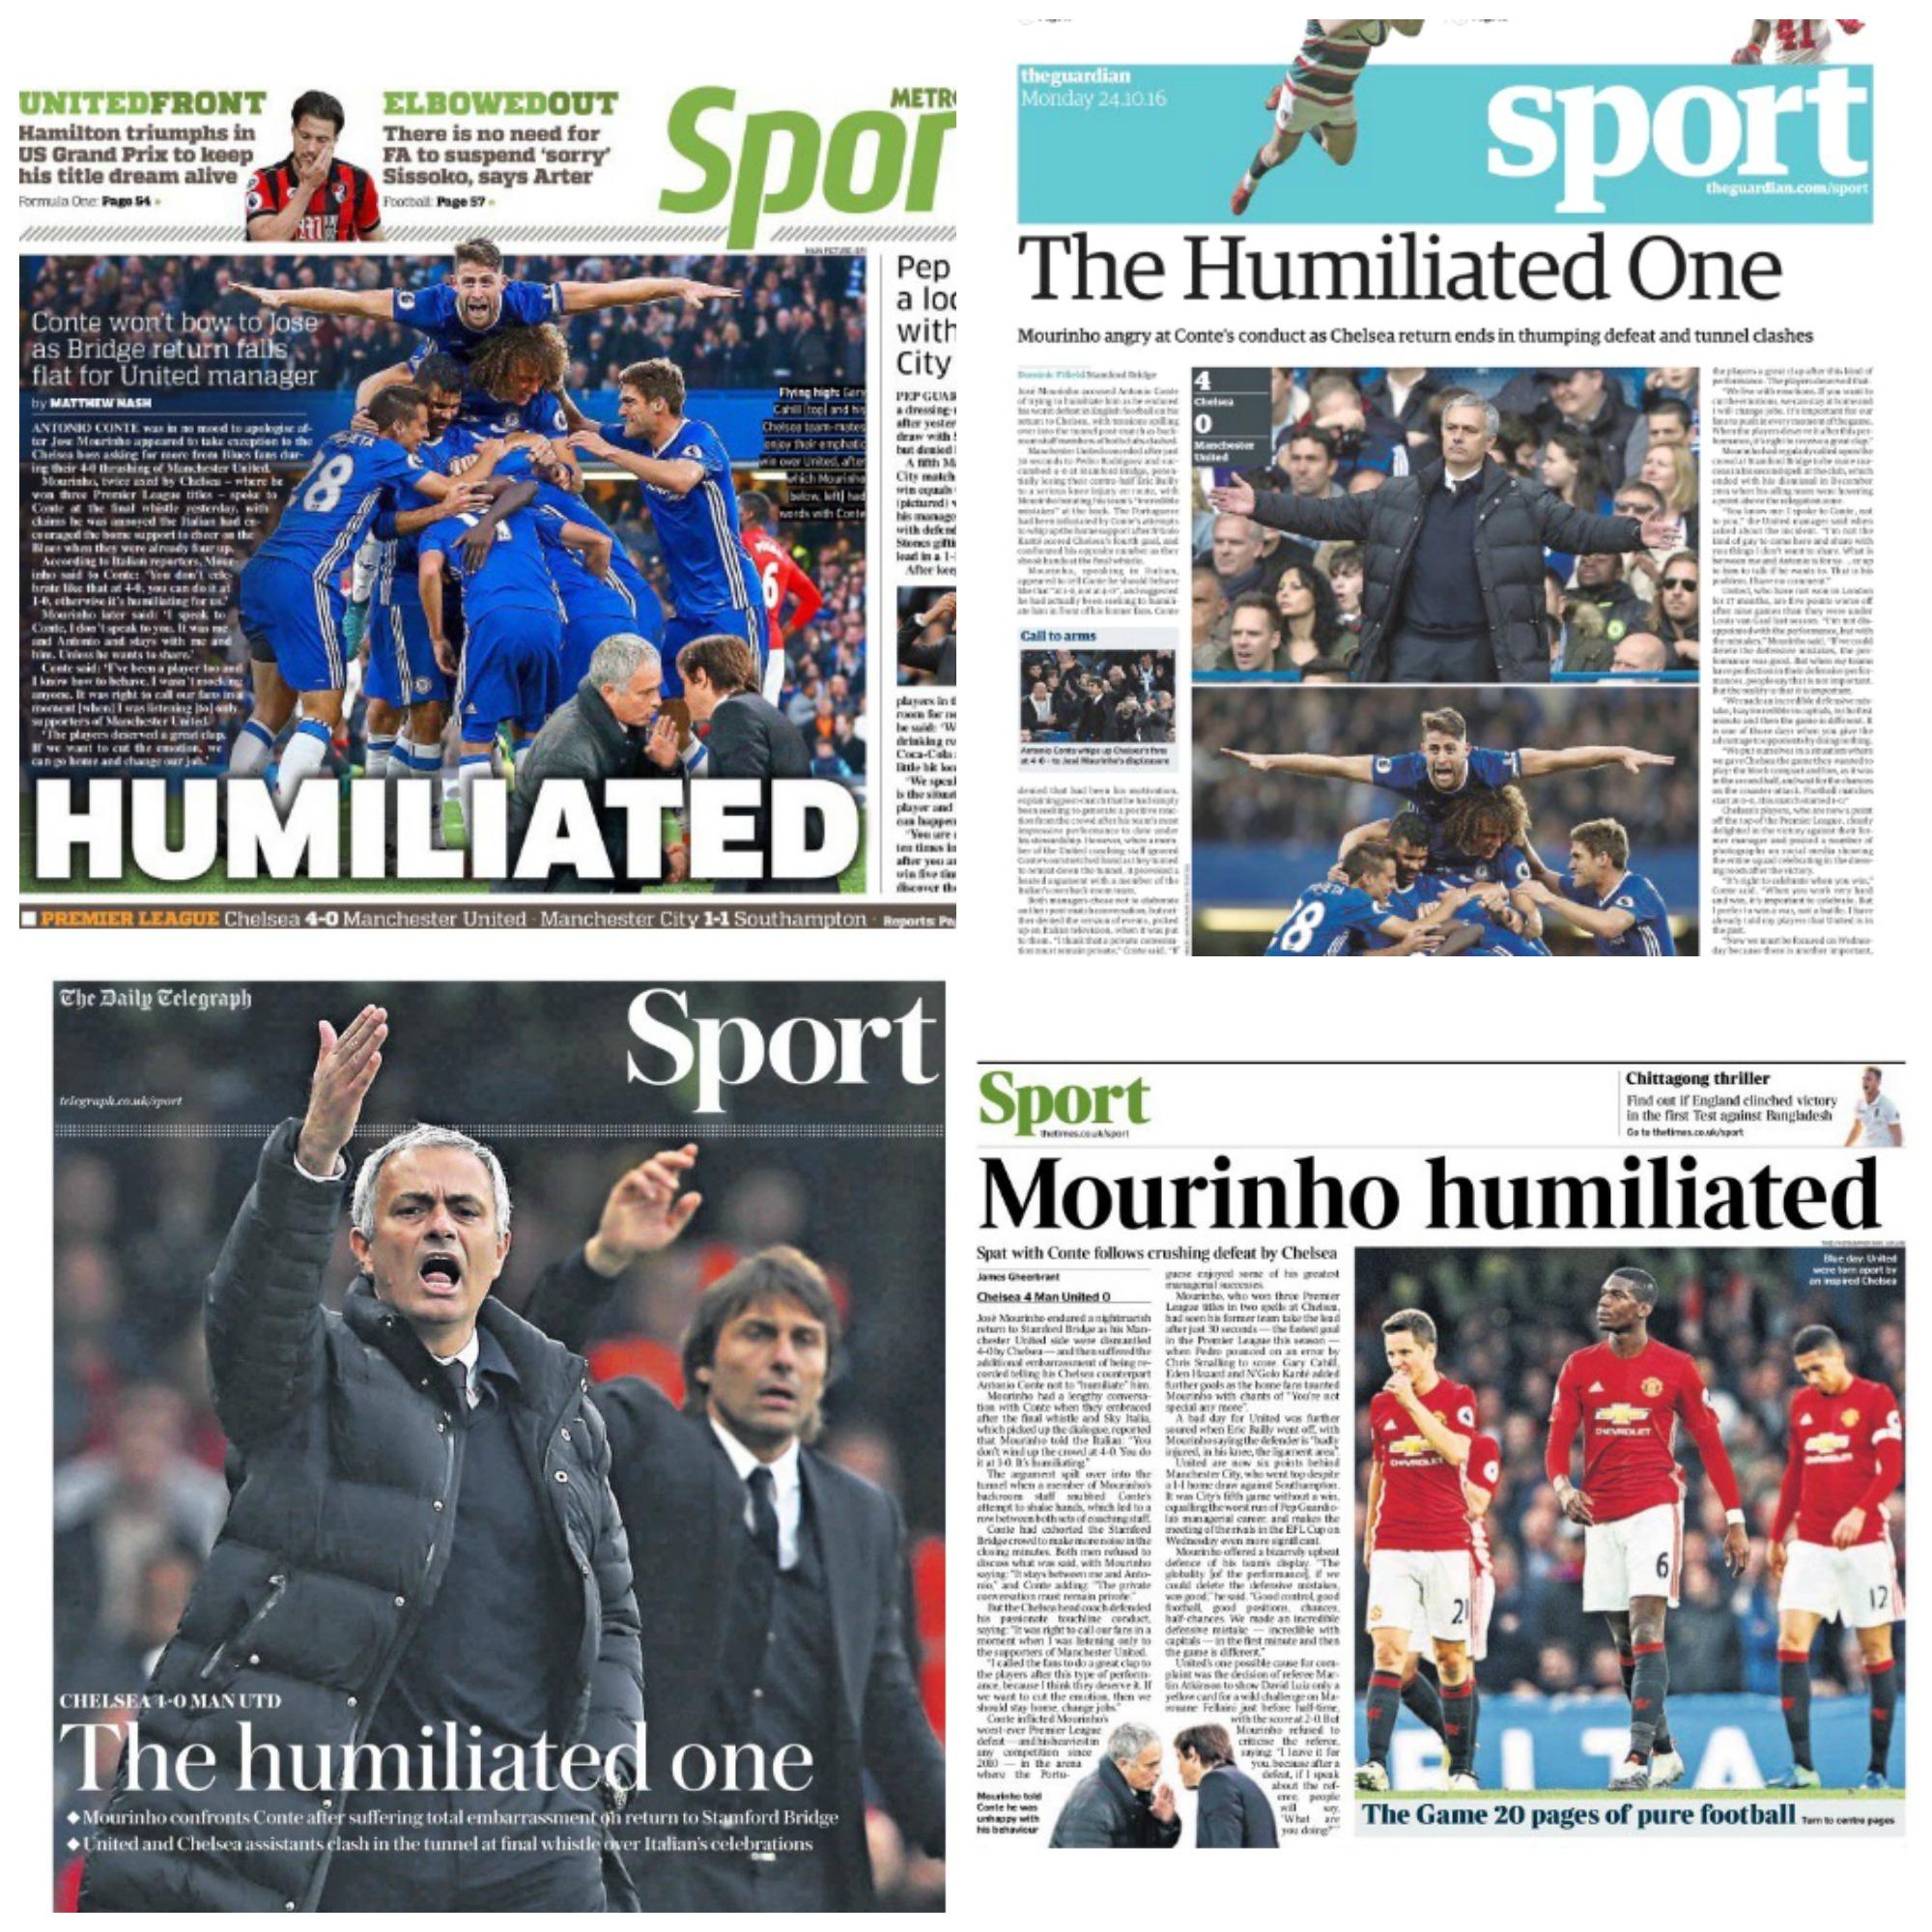 Mourinho-humillado.jpg